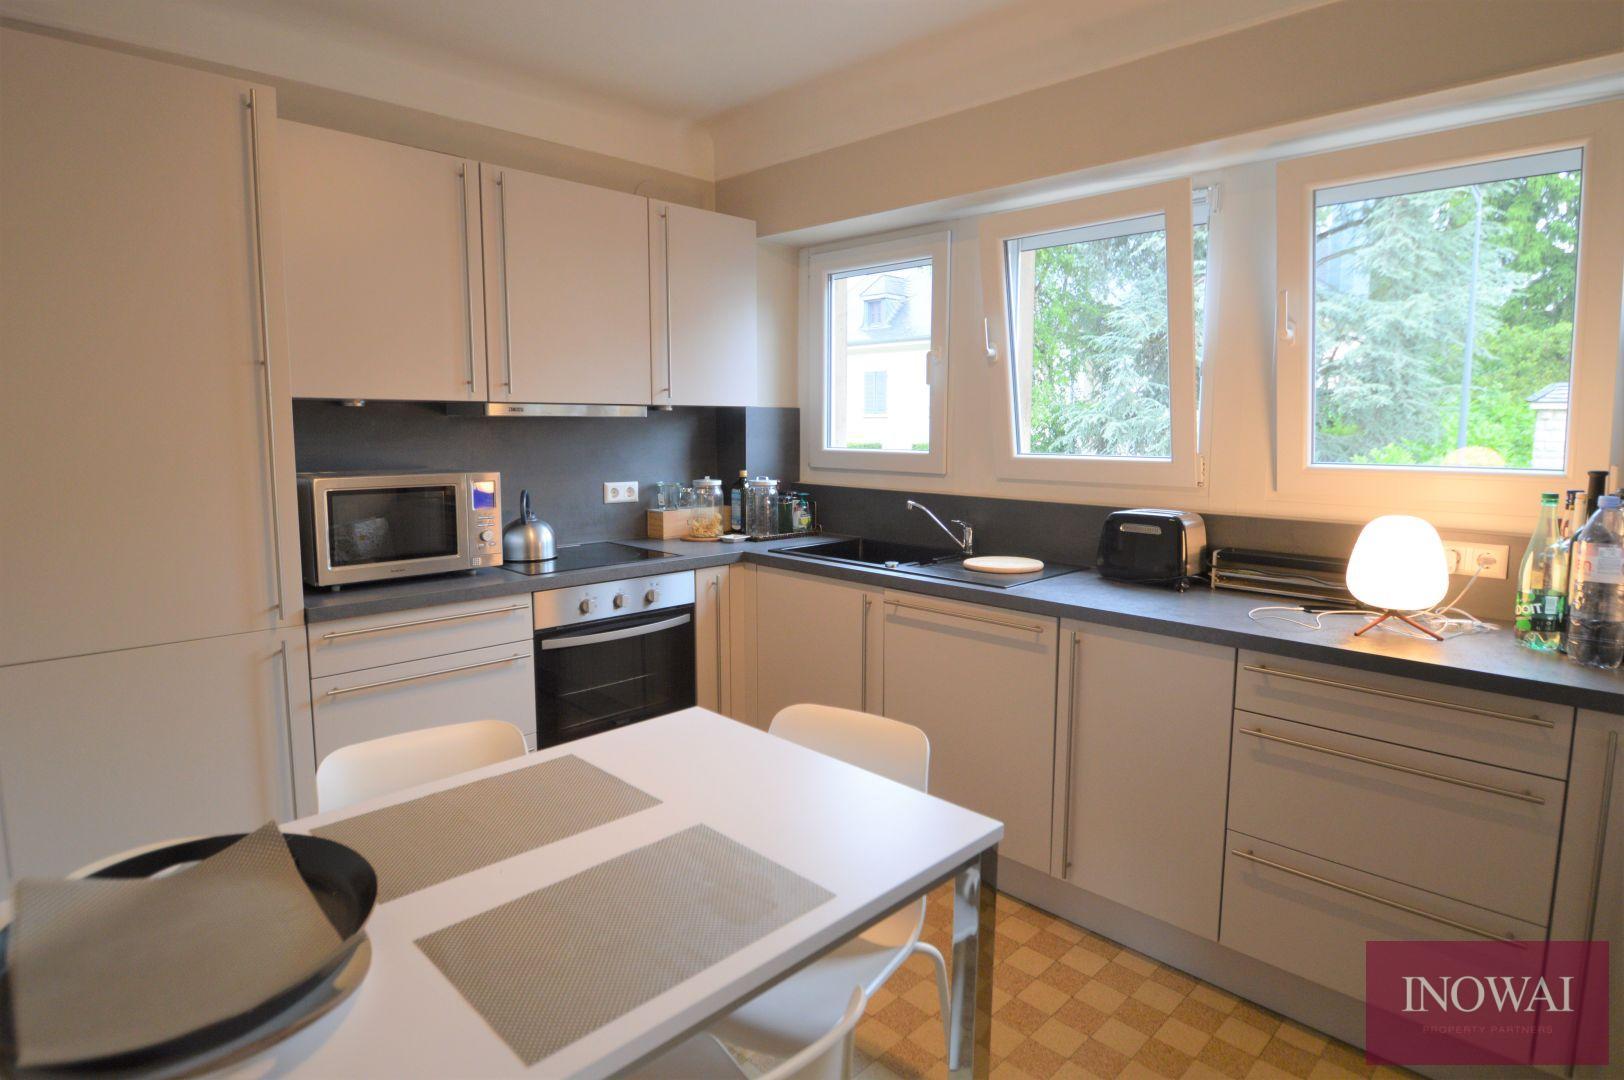 Appartement 2 chambres à Limpertsberg